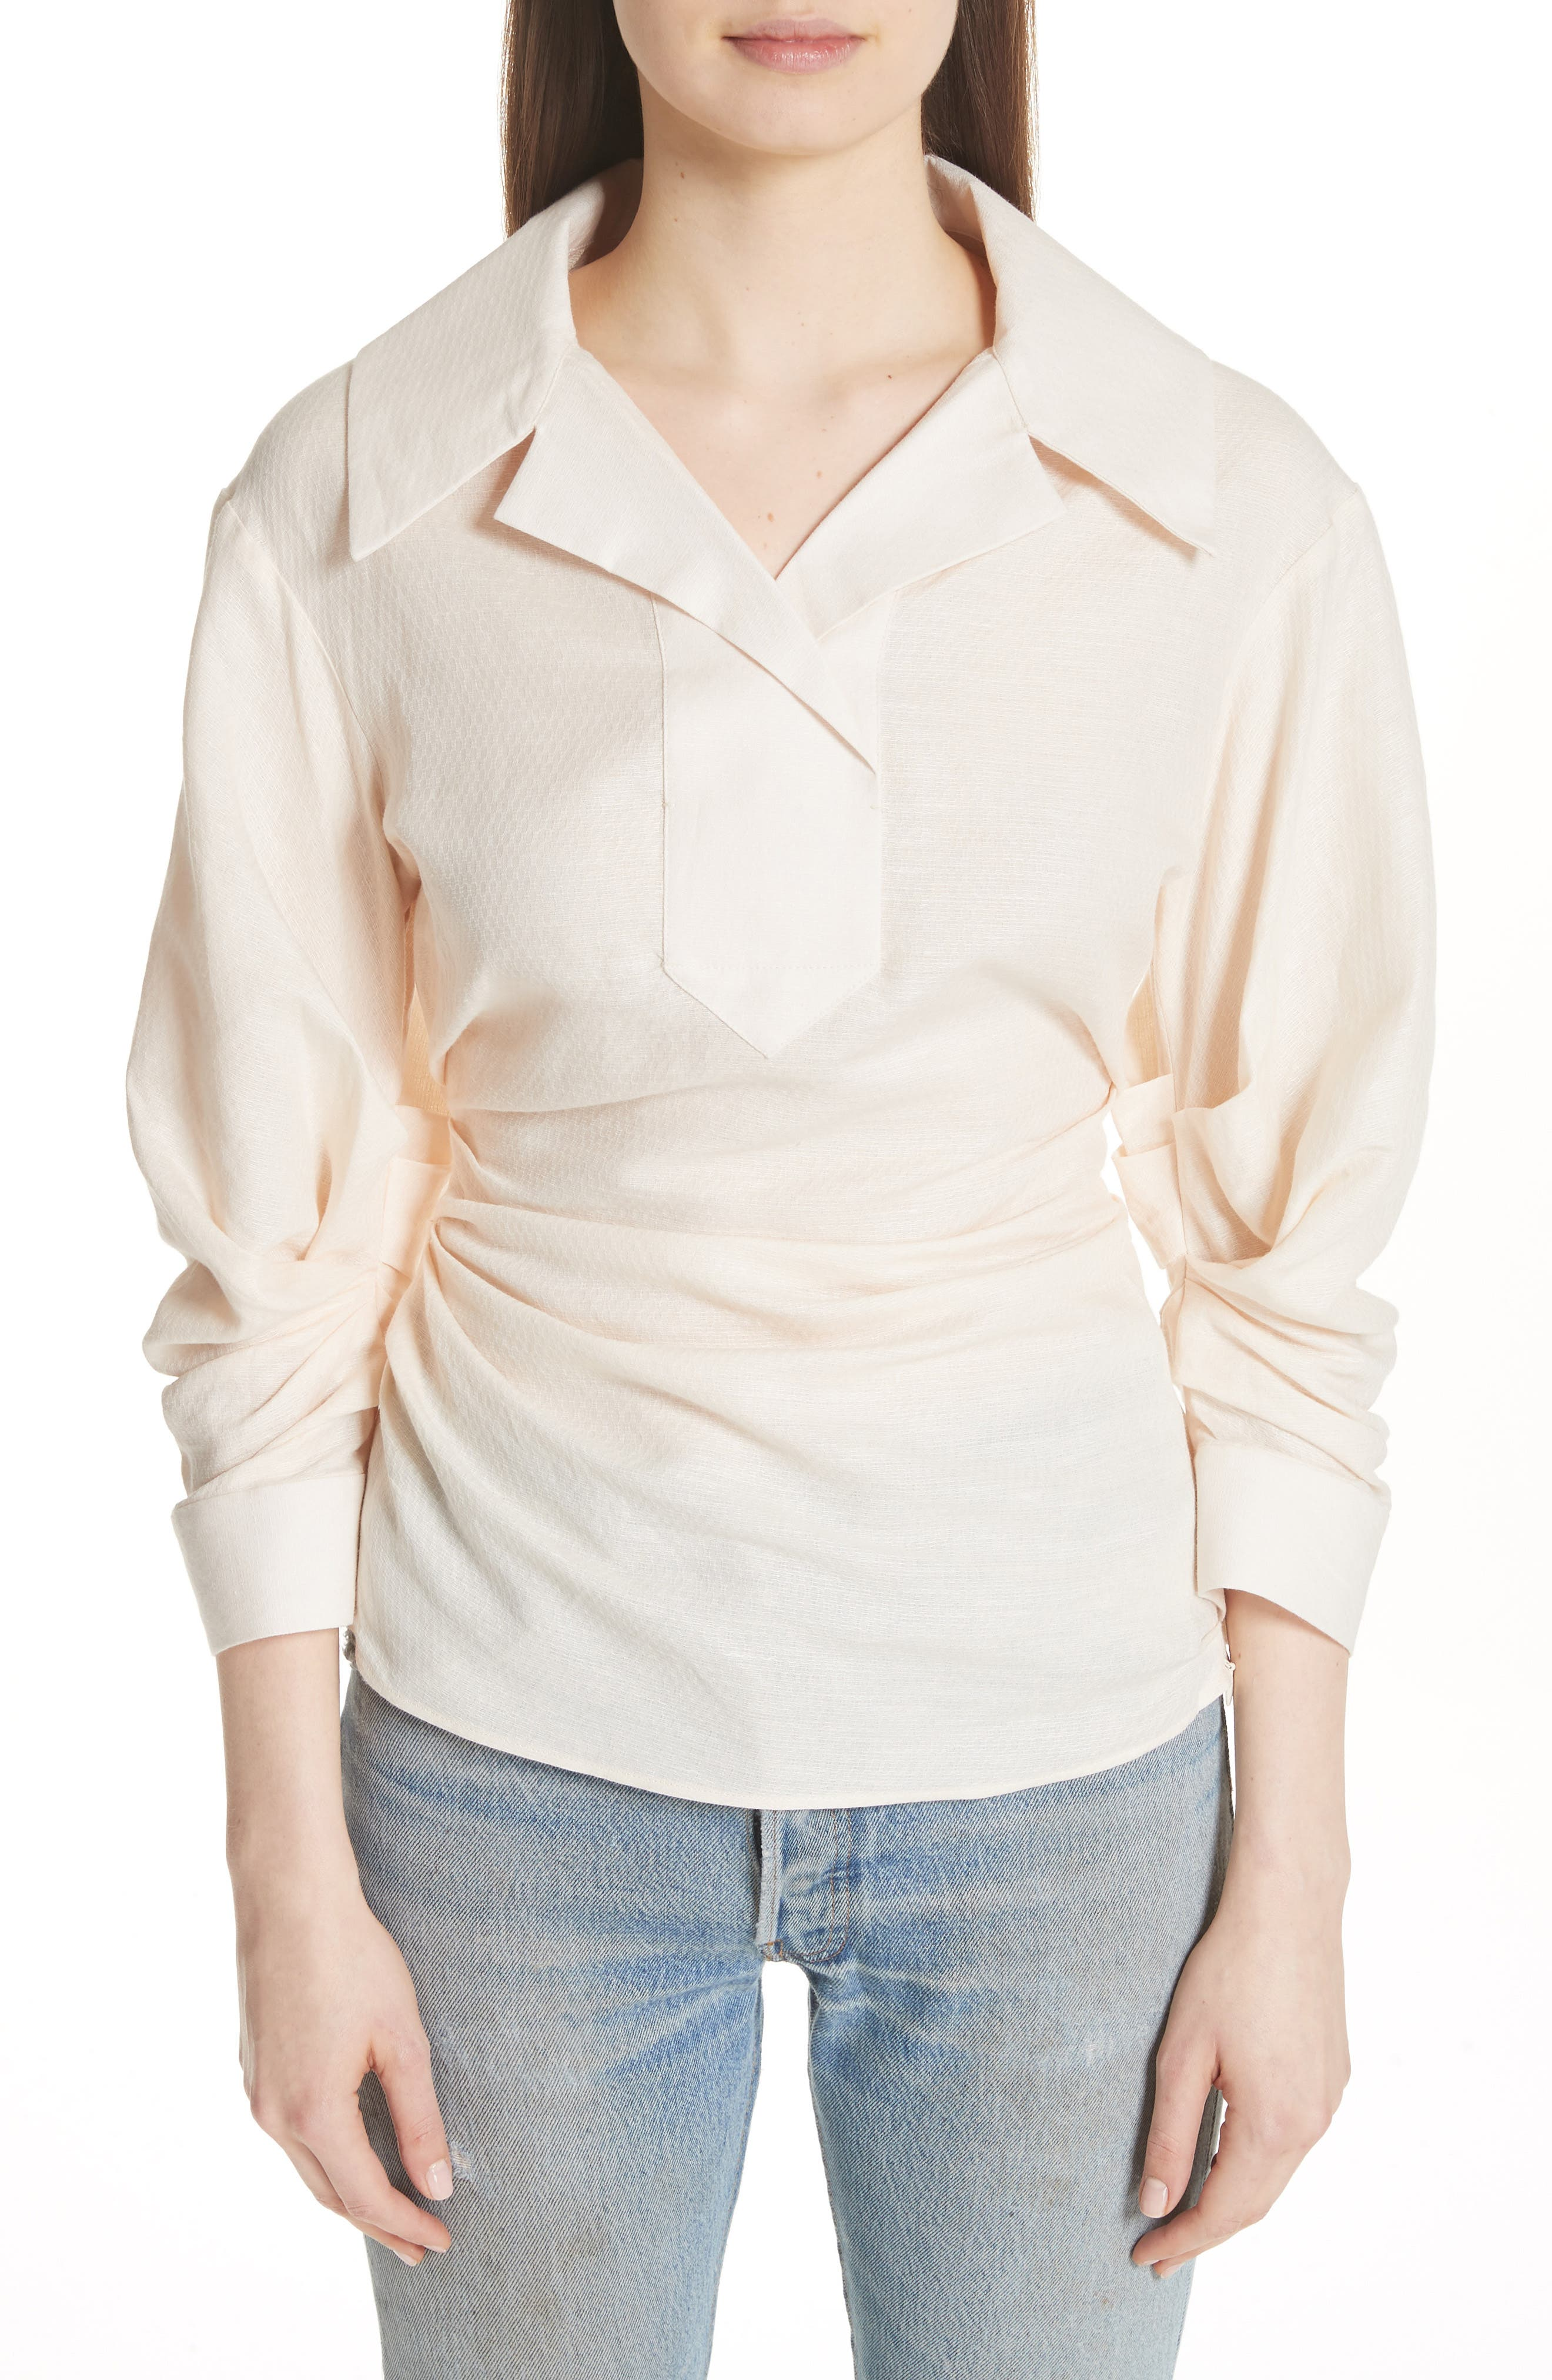 La Chemise Maceio Shirt,                         Main,                         color, 250